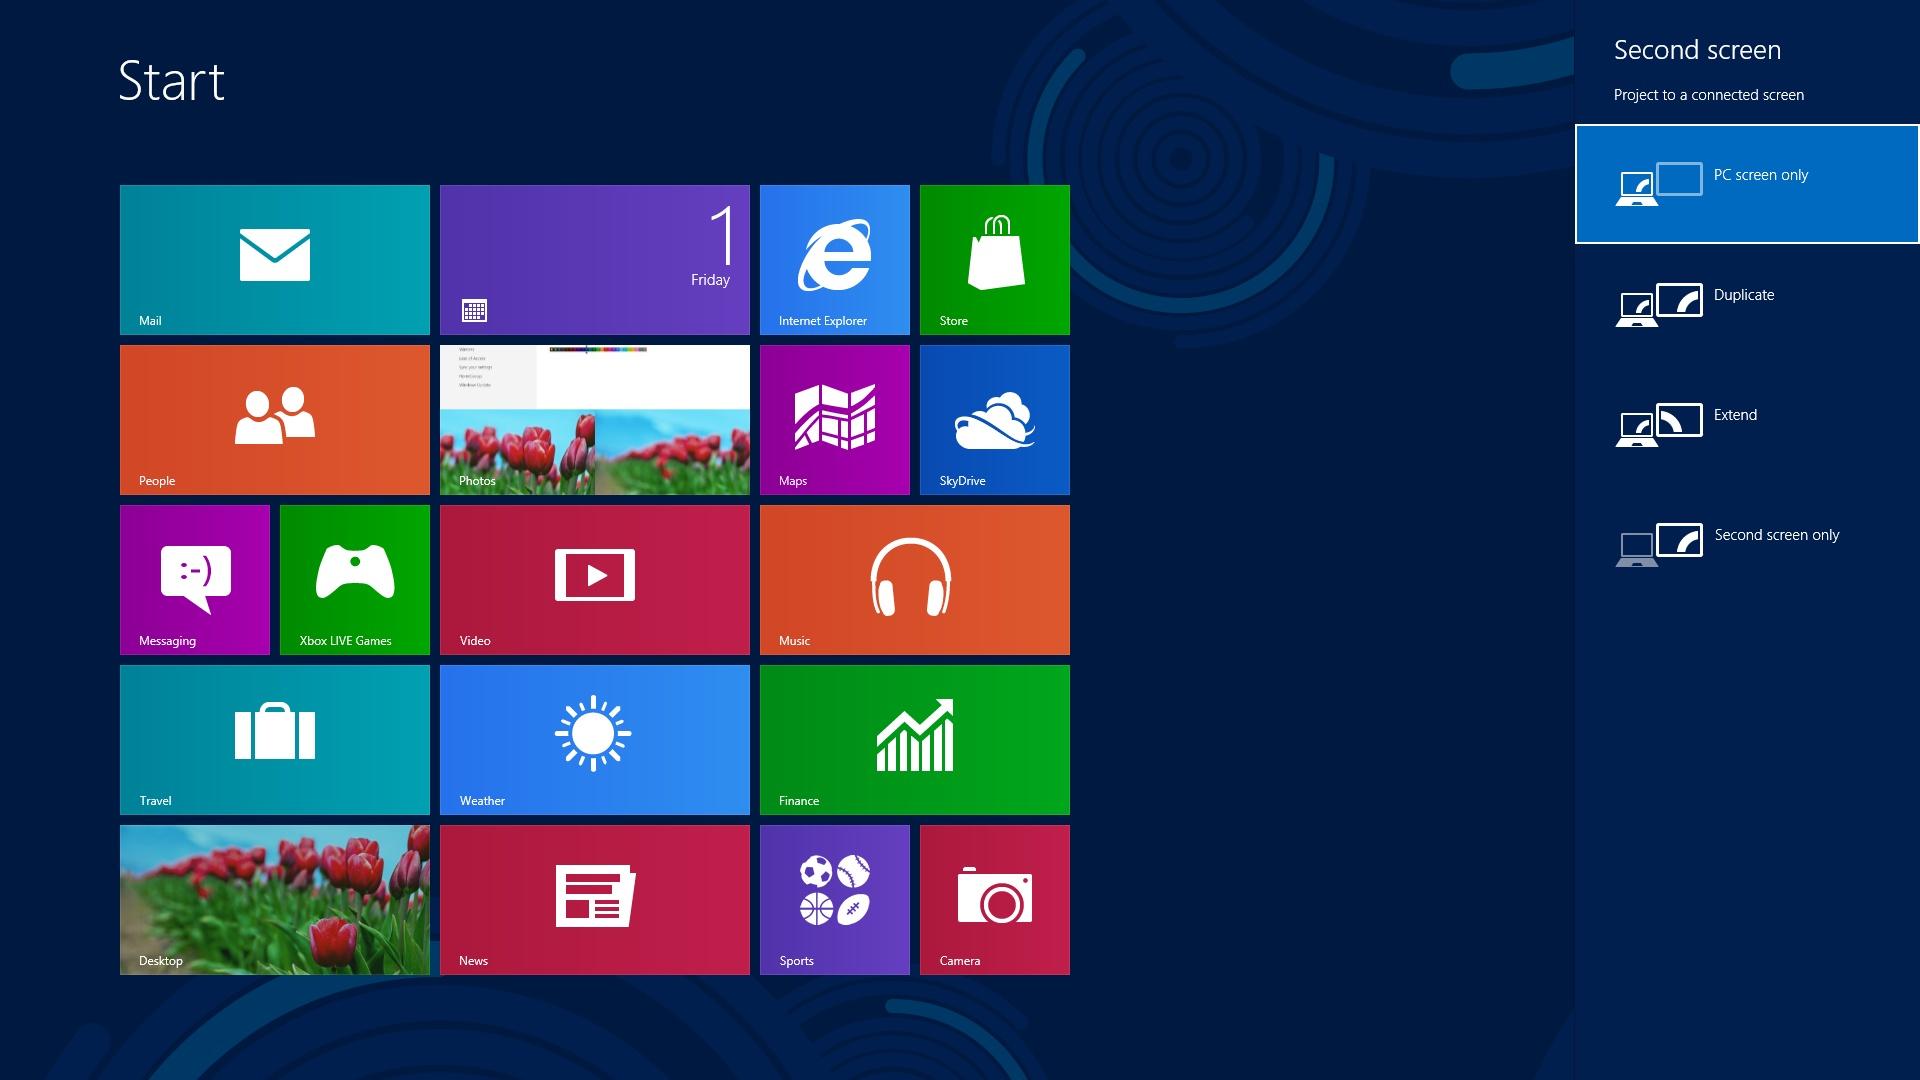 Kachel design  Windows 8: Microsoft wegen Kachel-Design verklagt